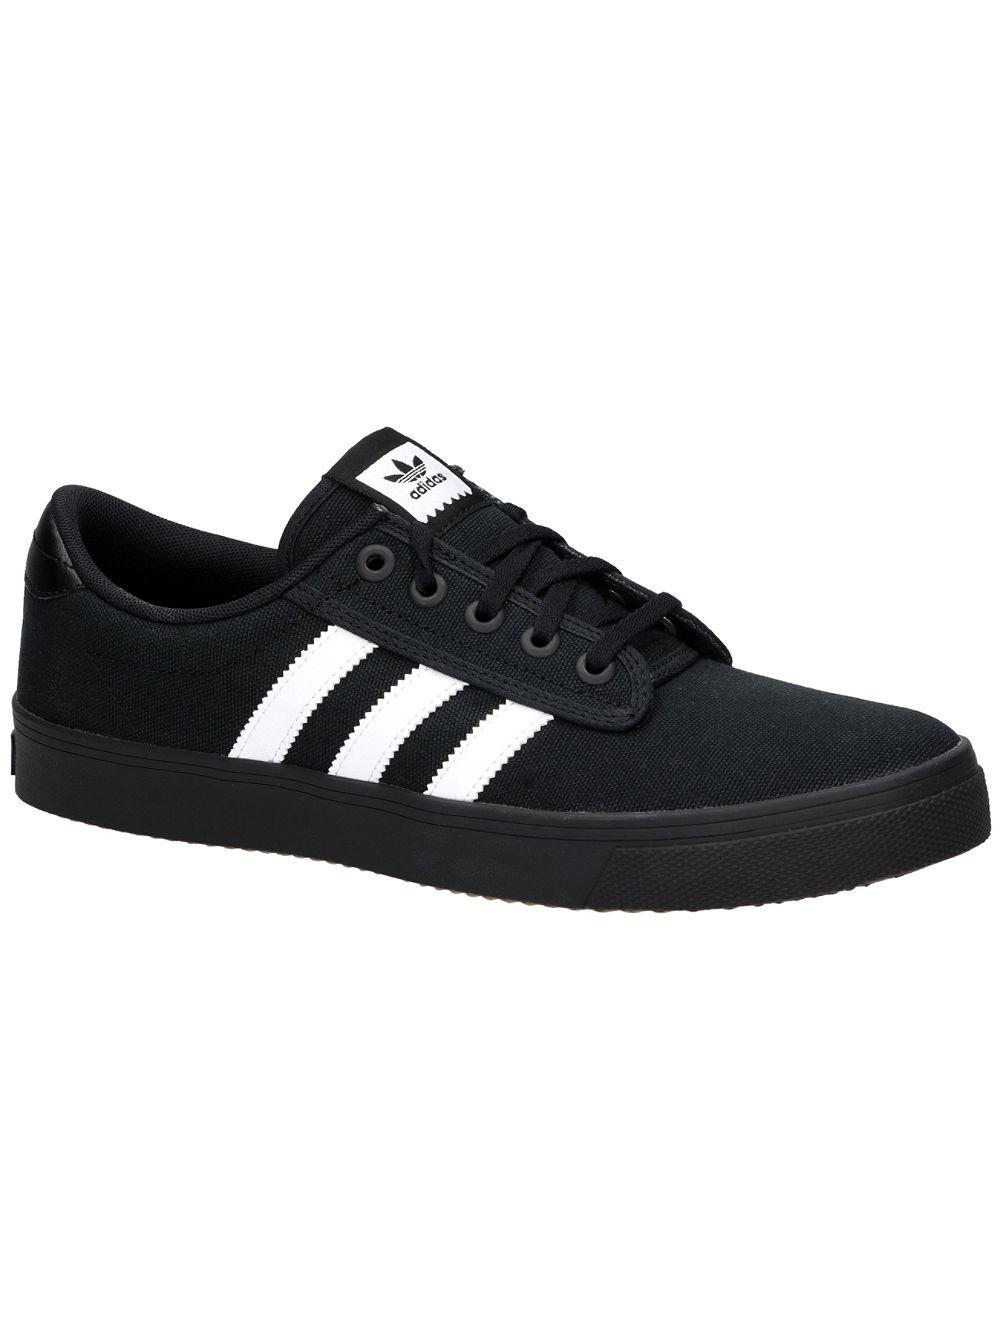 e1bd3a4ac40bc3 Buy adidas Skateboarding Kiel Skate Shoes online at blue-tomato.com